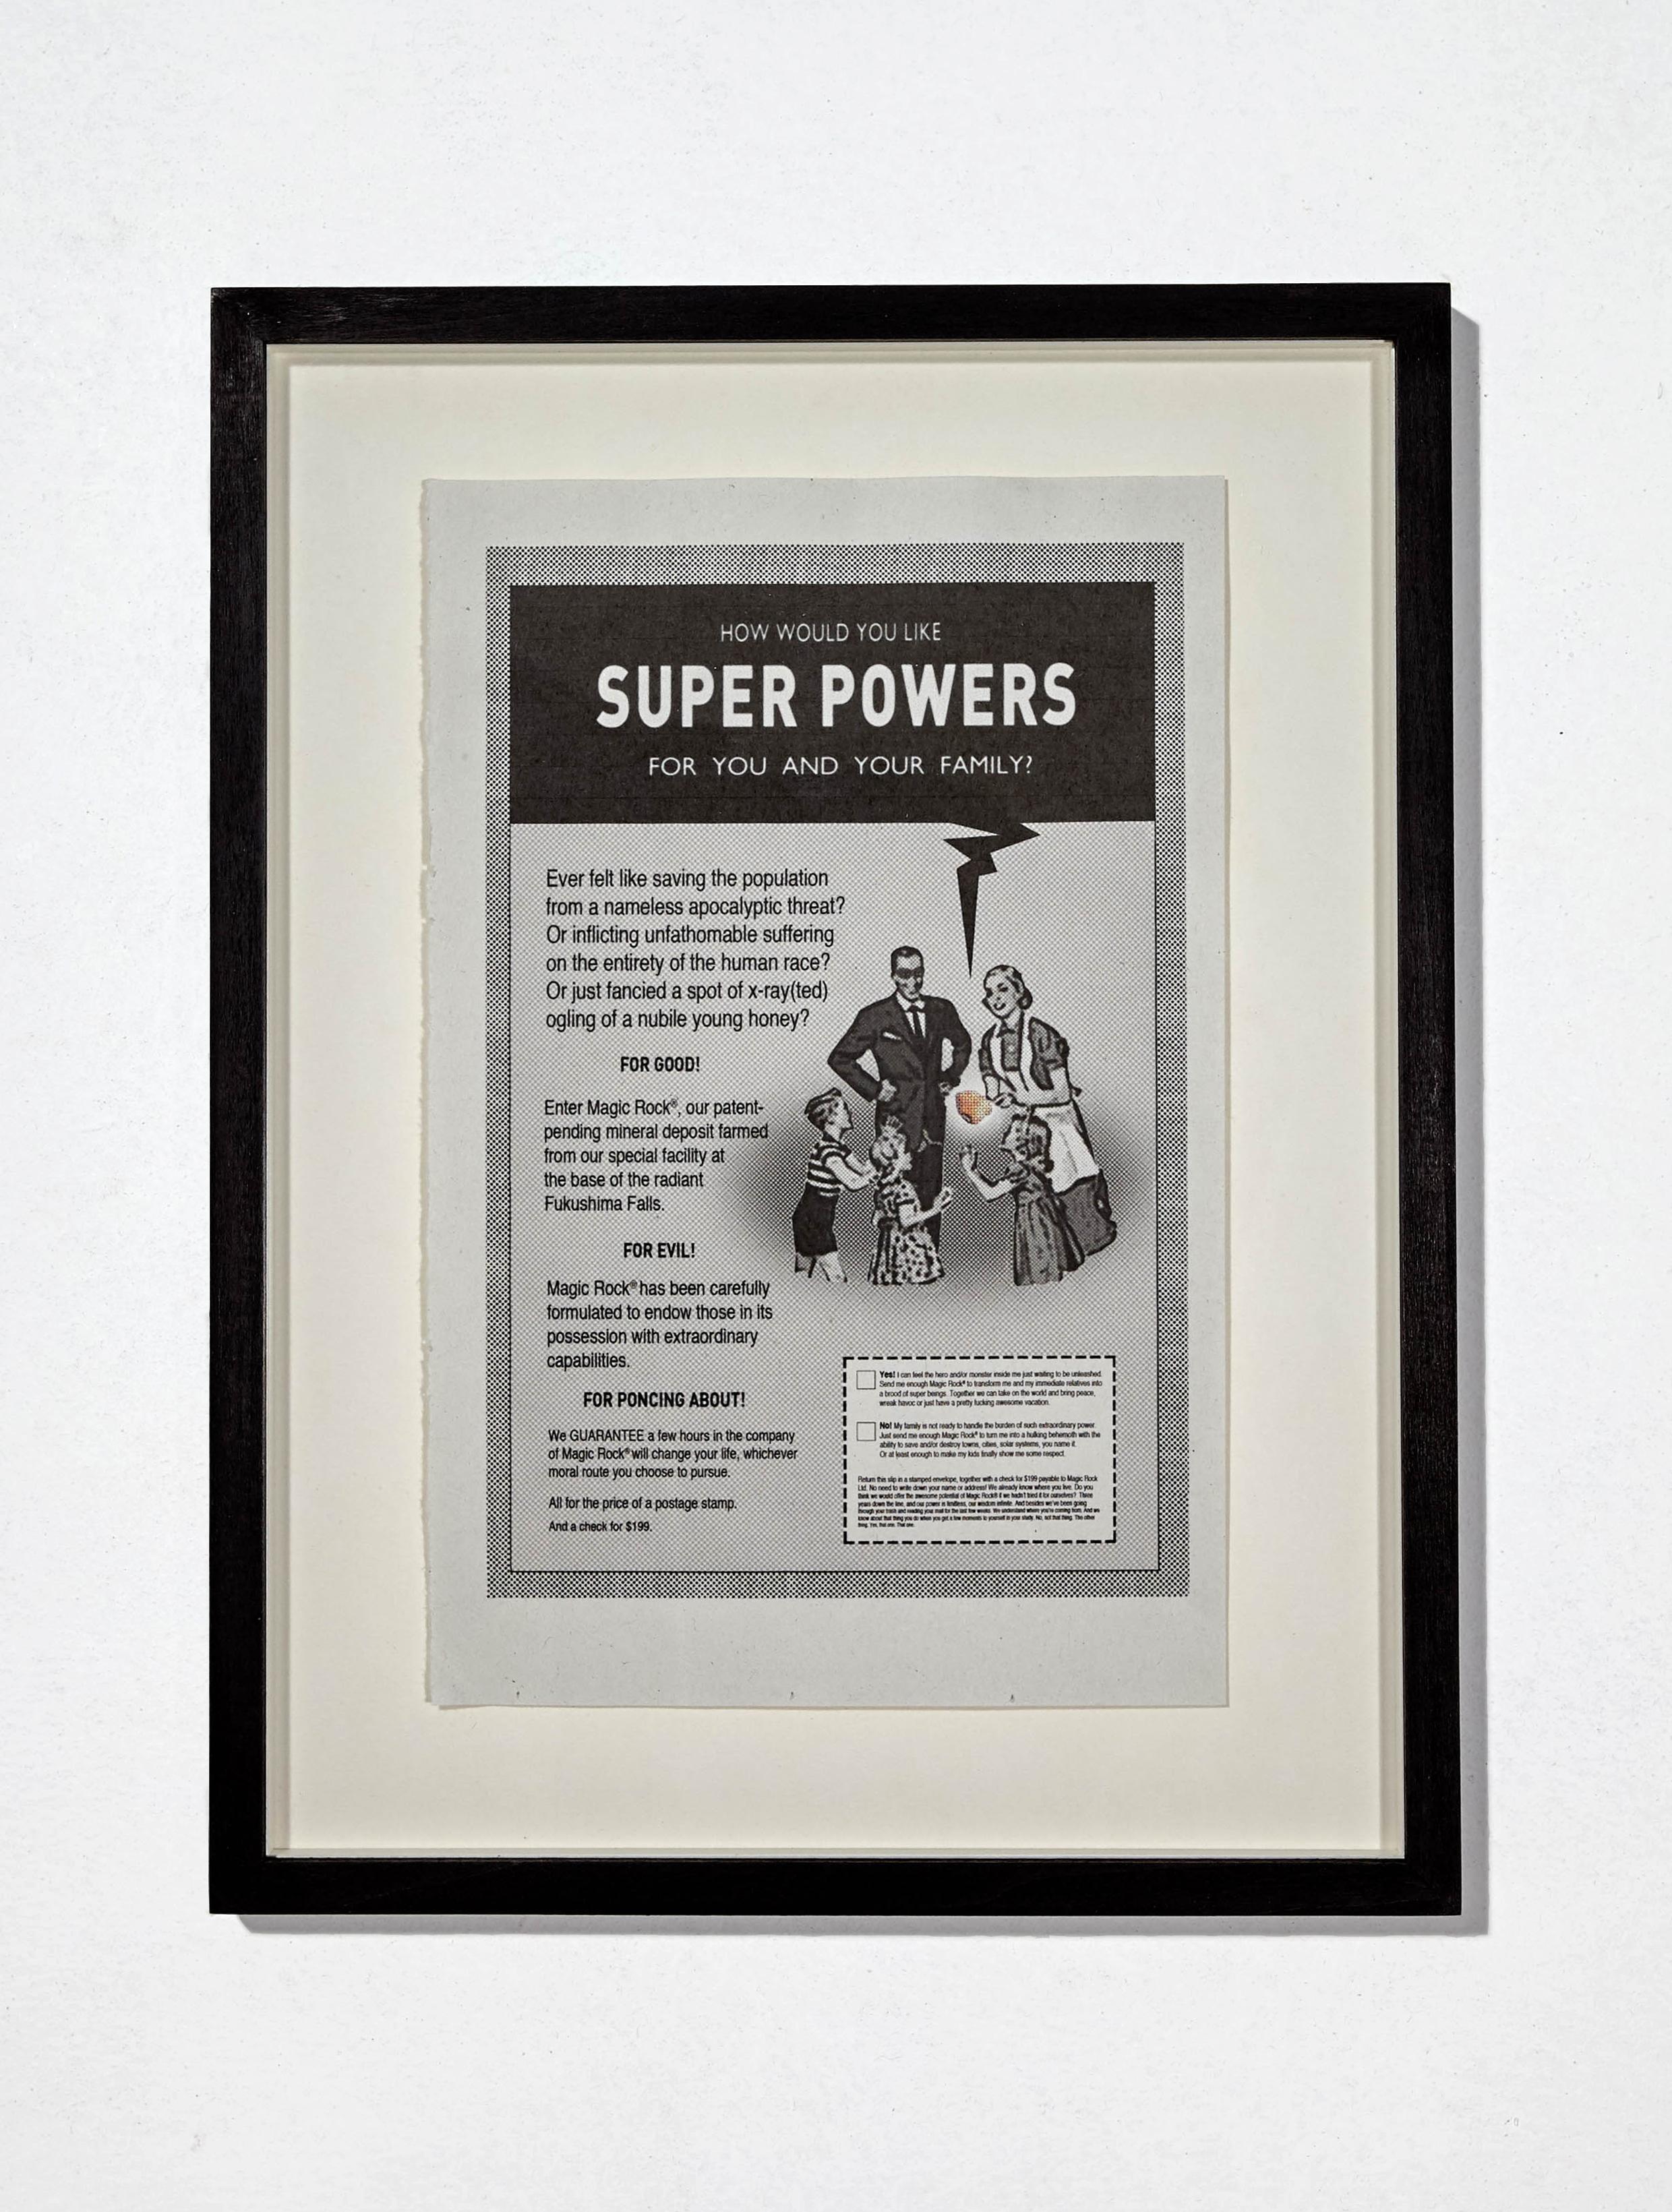 Unfound object VI (Superpowers)